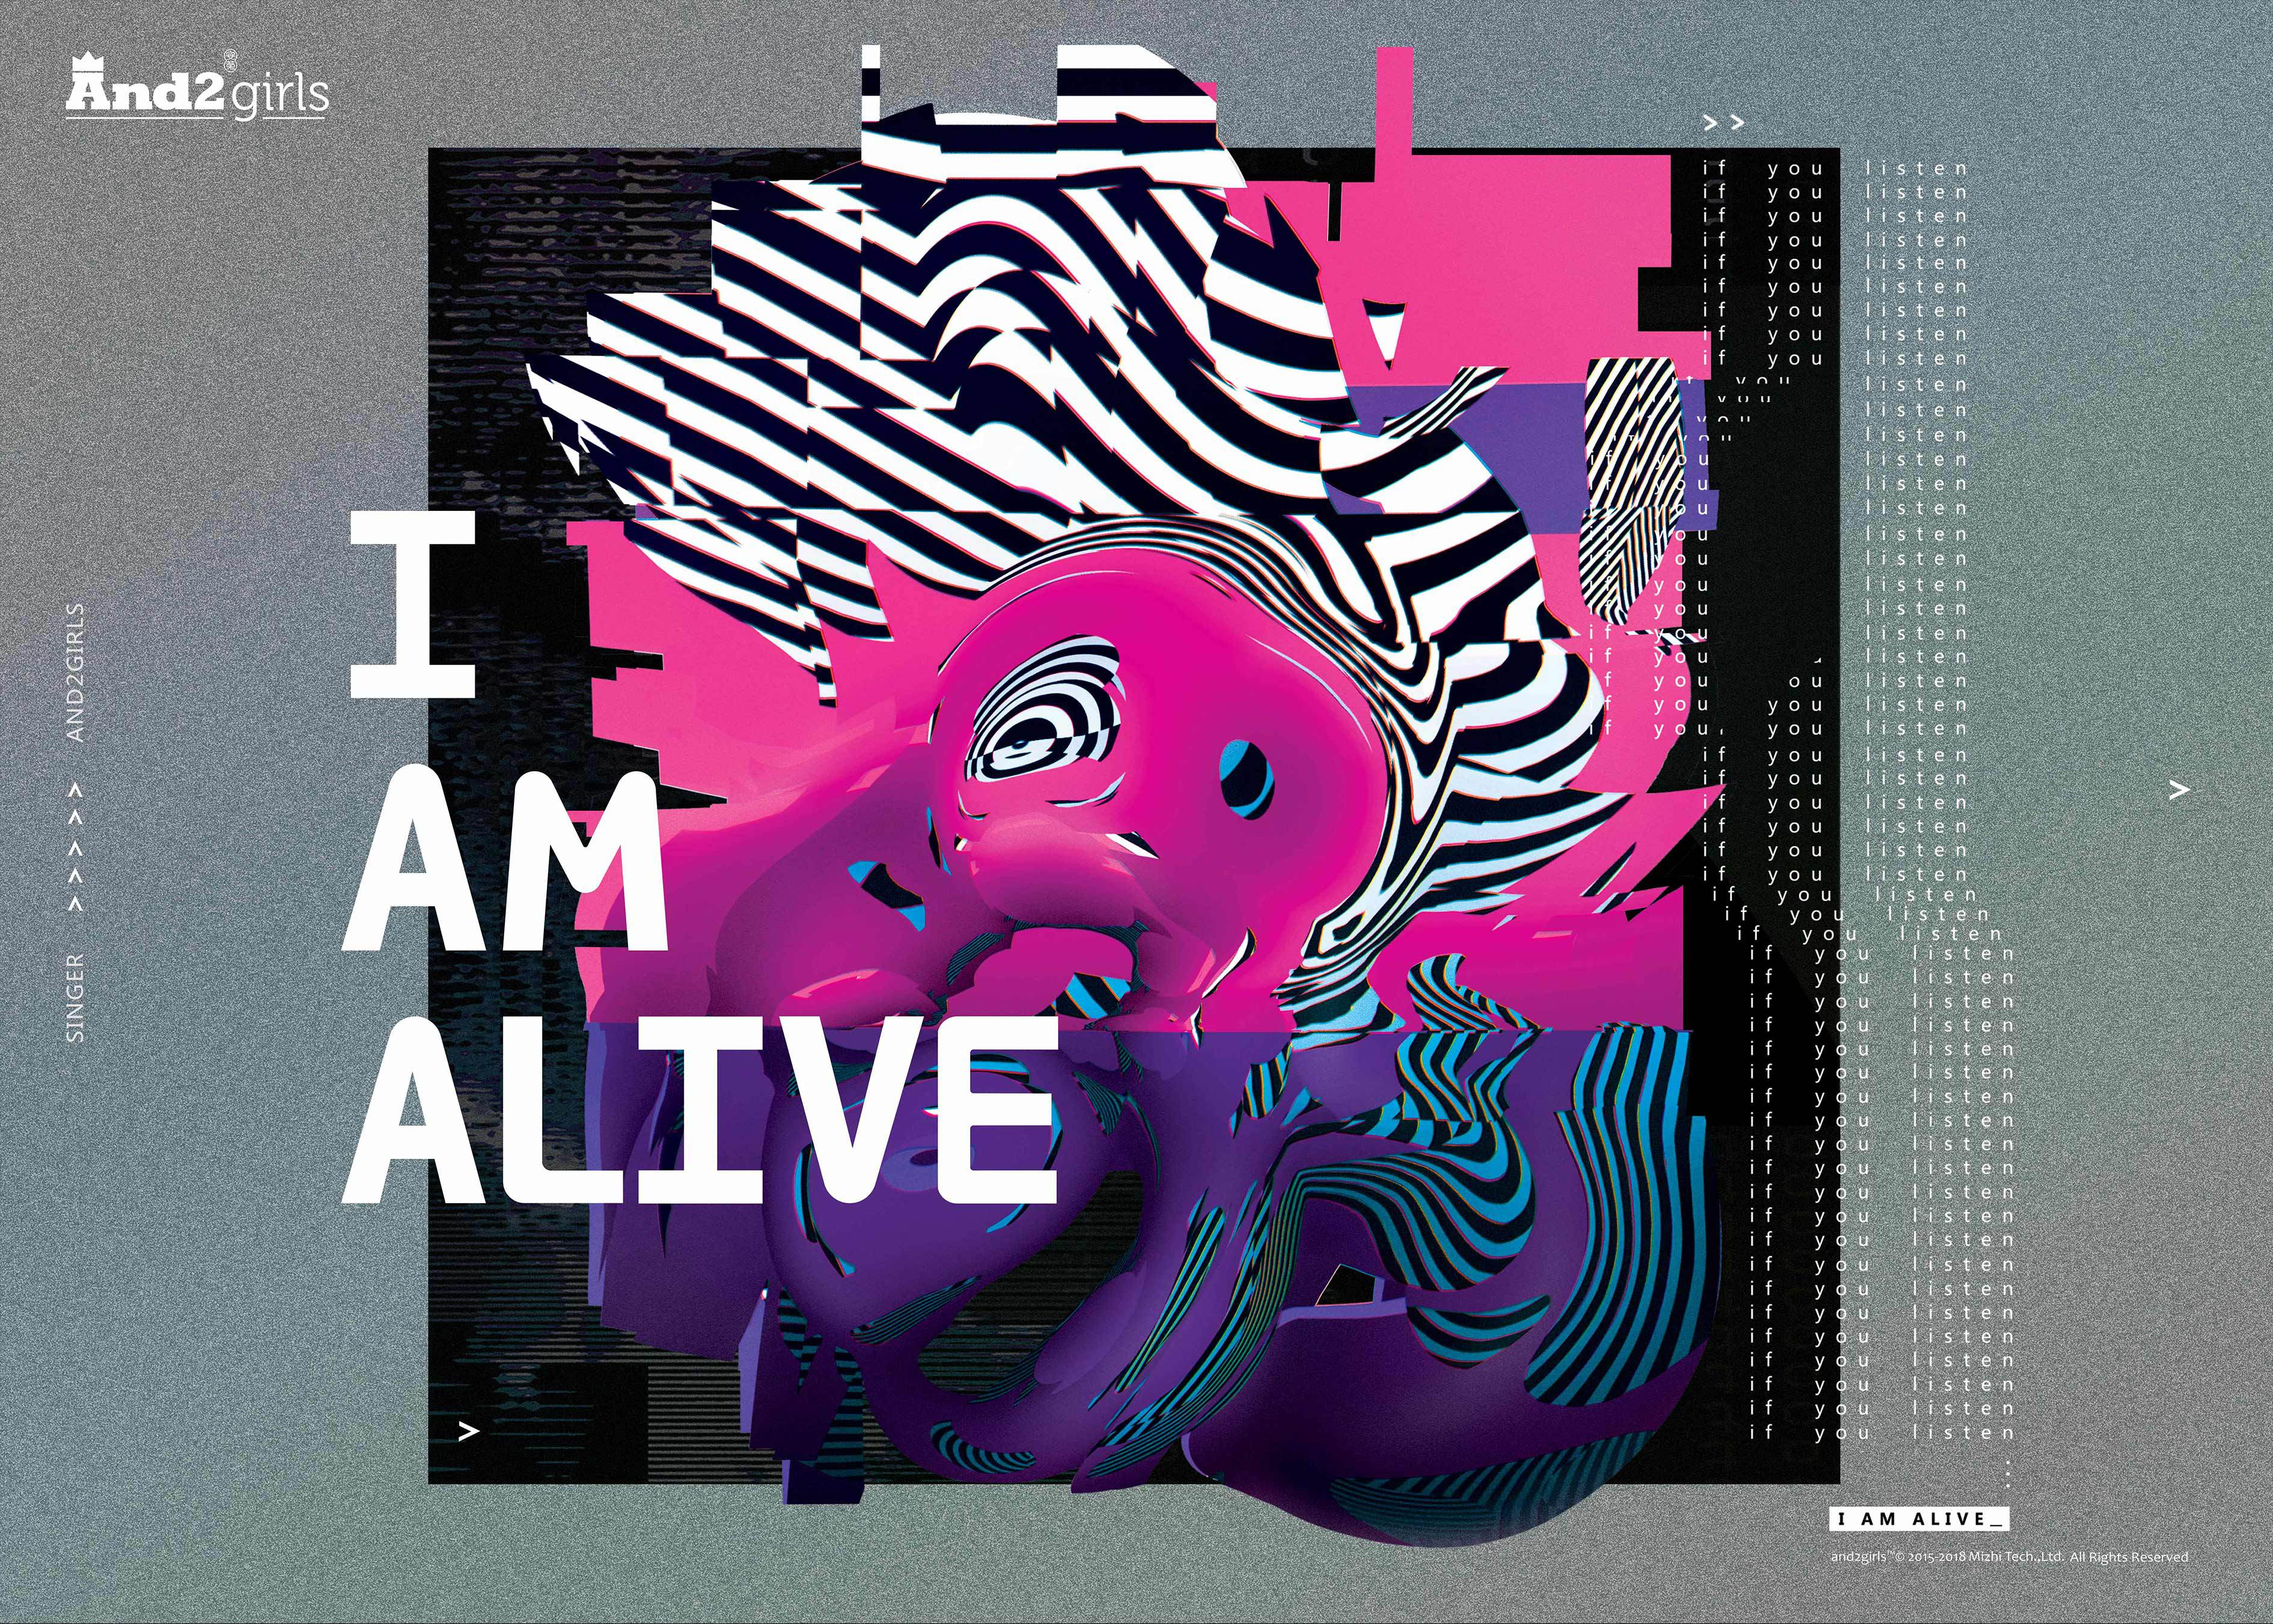 And2girls新歌《I'm Alive》满屏科技感